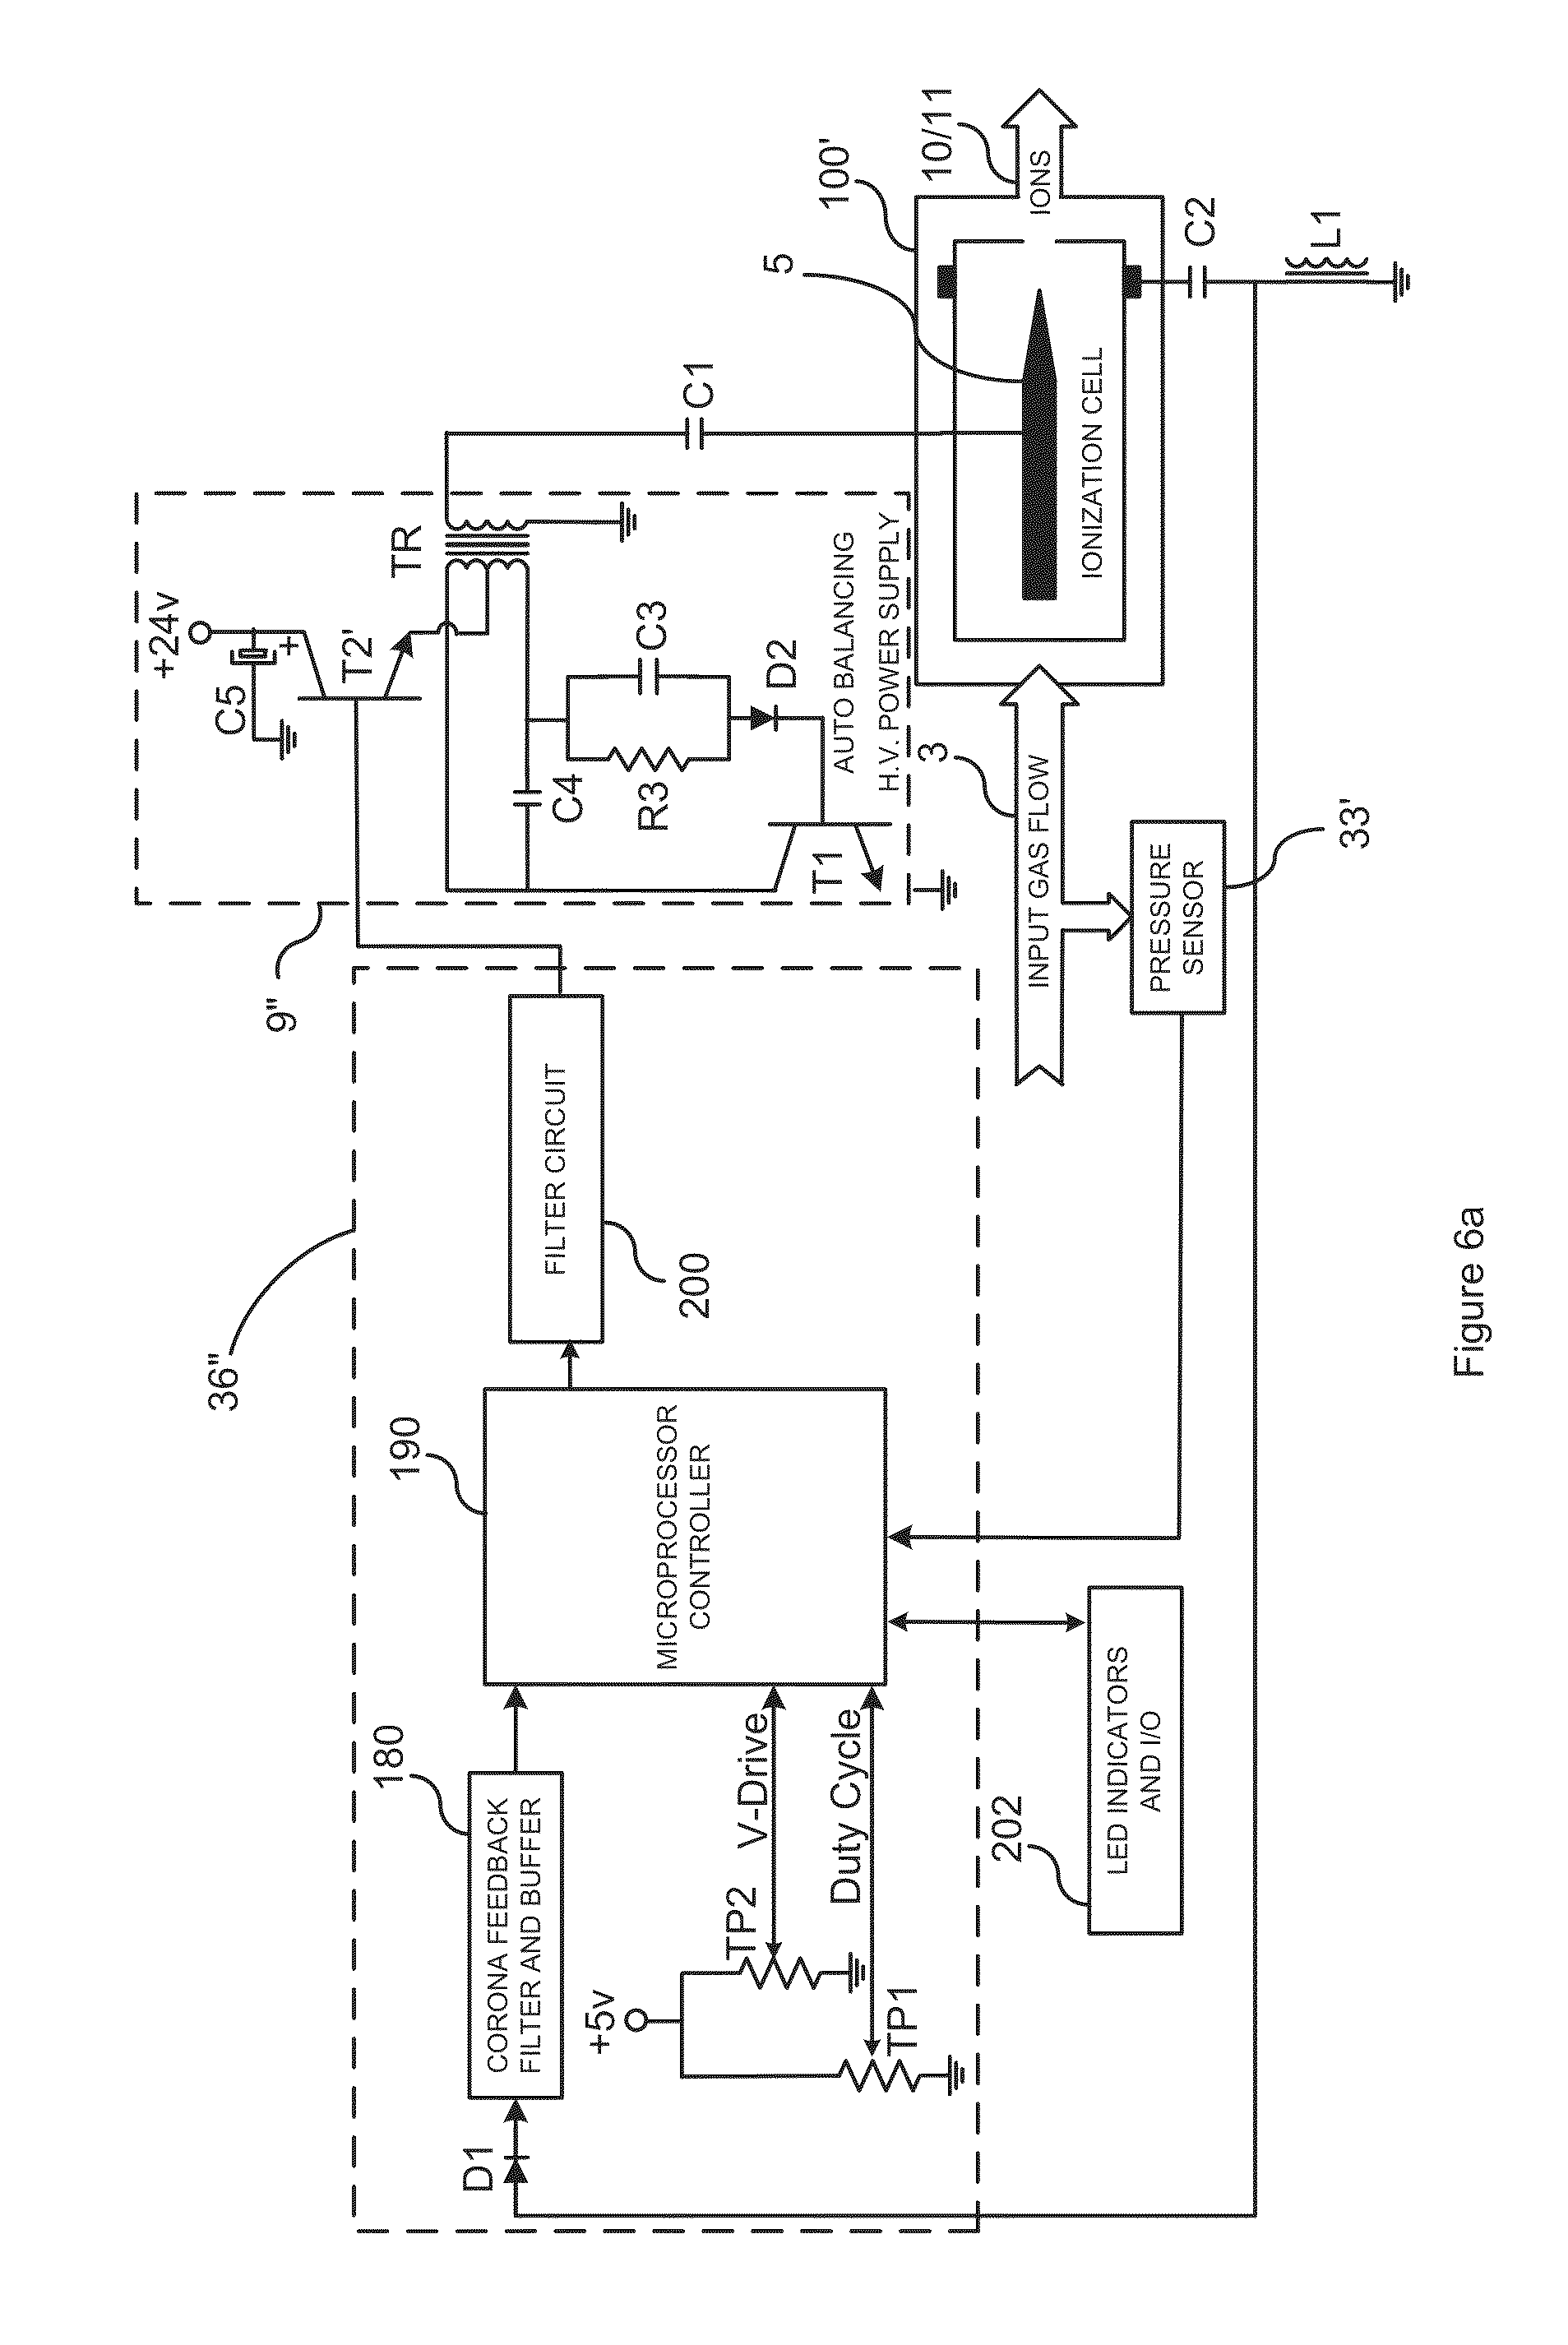 Ionizer Transormer Dc Power Supply Wiring Diagram on Dc Boost Converter Circuit